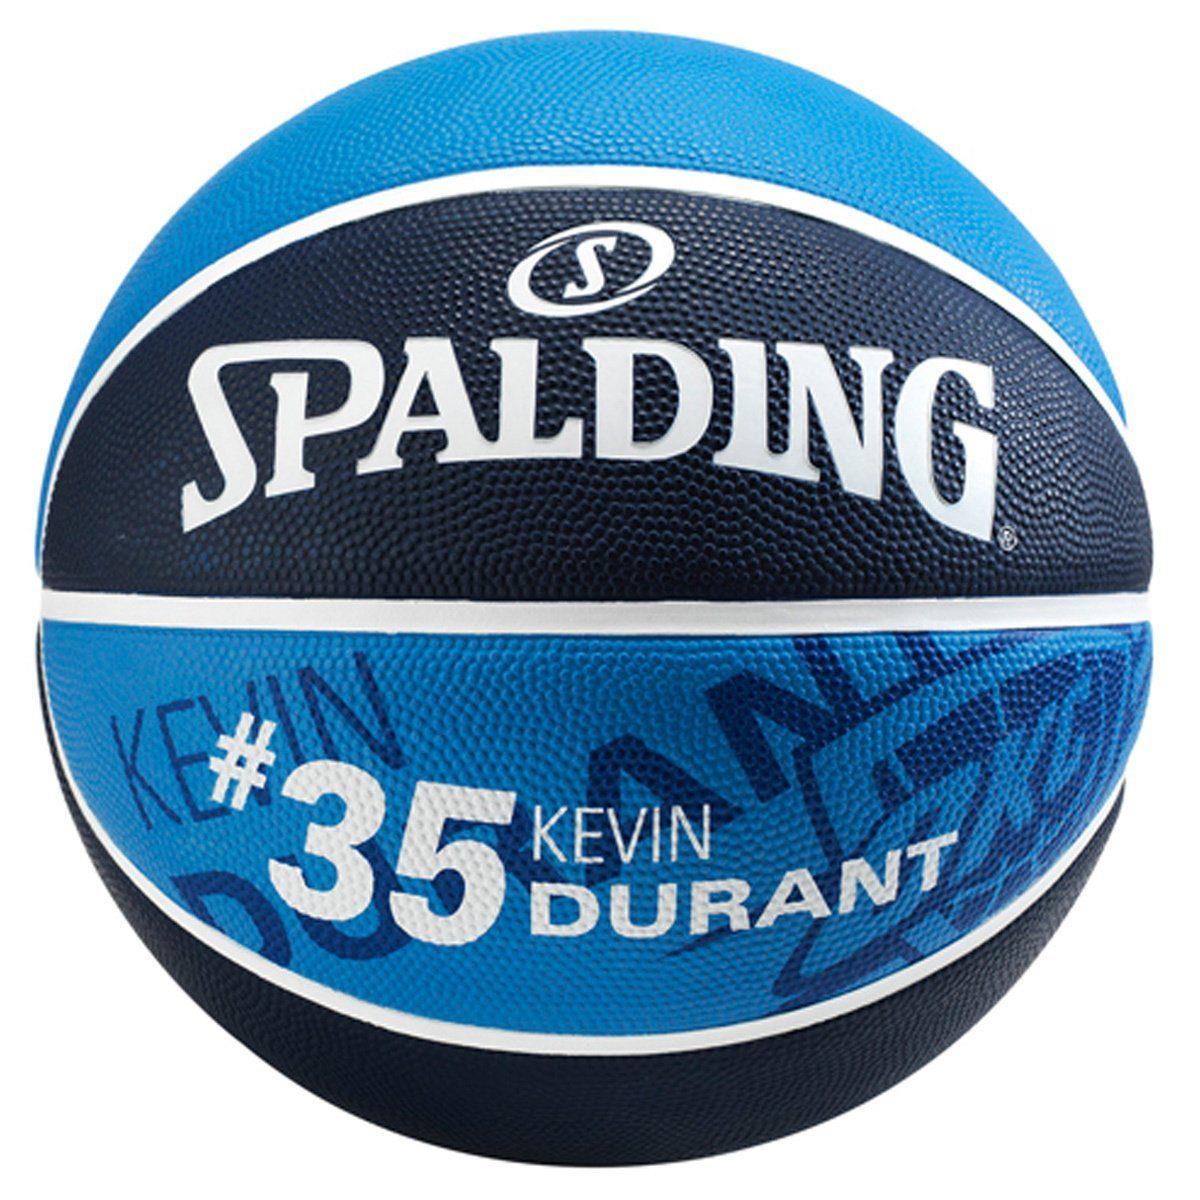 SPALDING NBA Player Kevin Durant Basketball